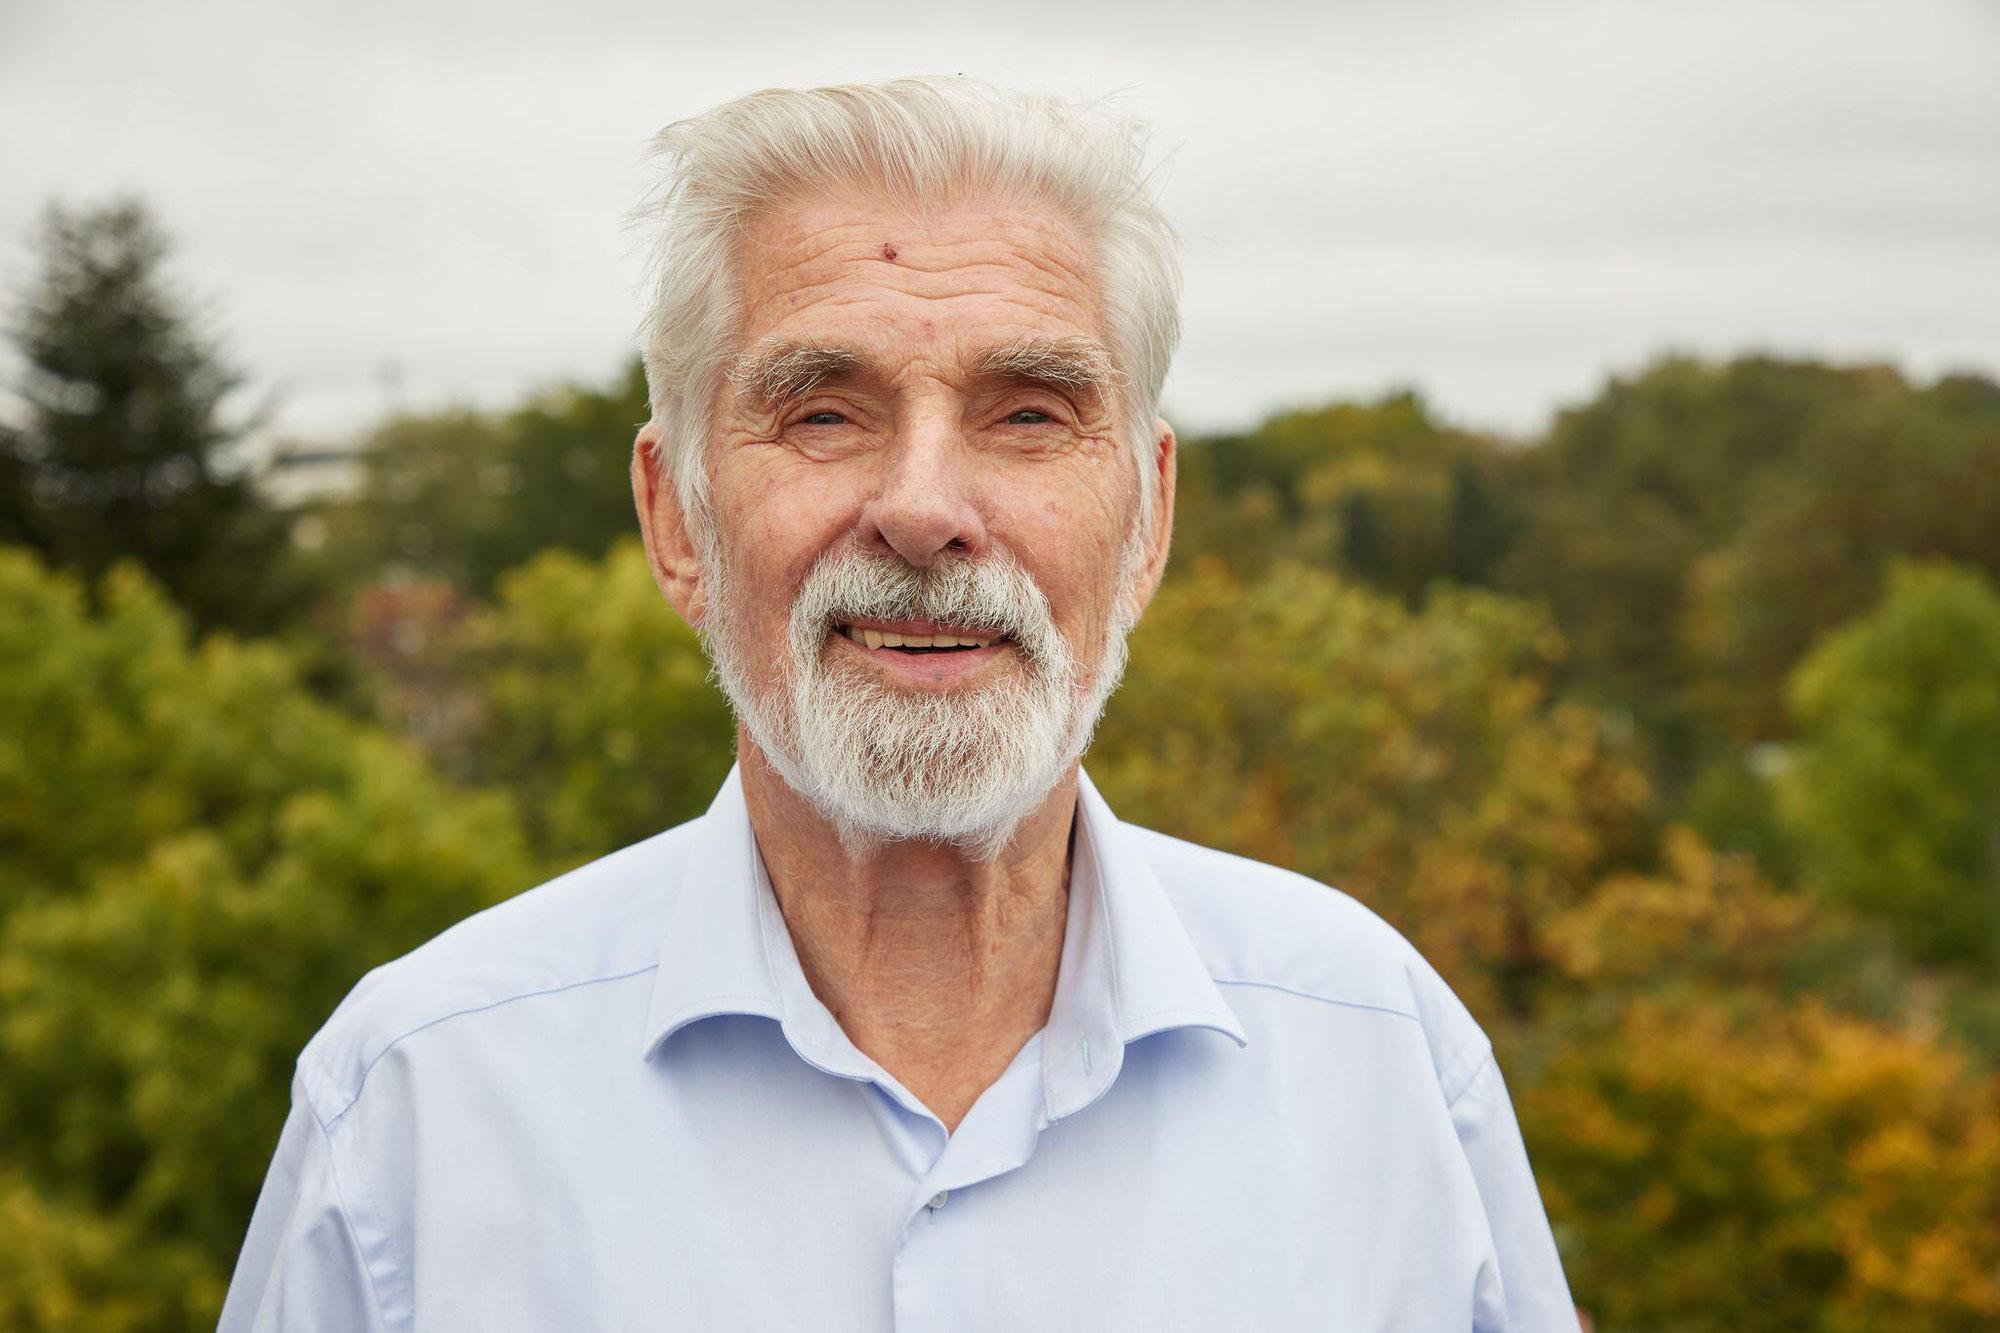 Hamburger Klimaforscher Prof. Hasselmann erhält Physik-Nobelpreis